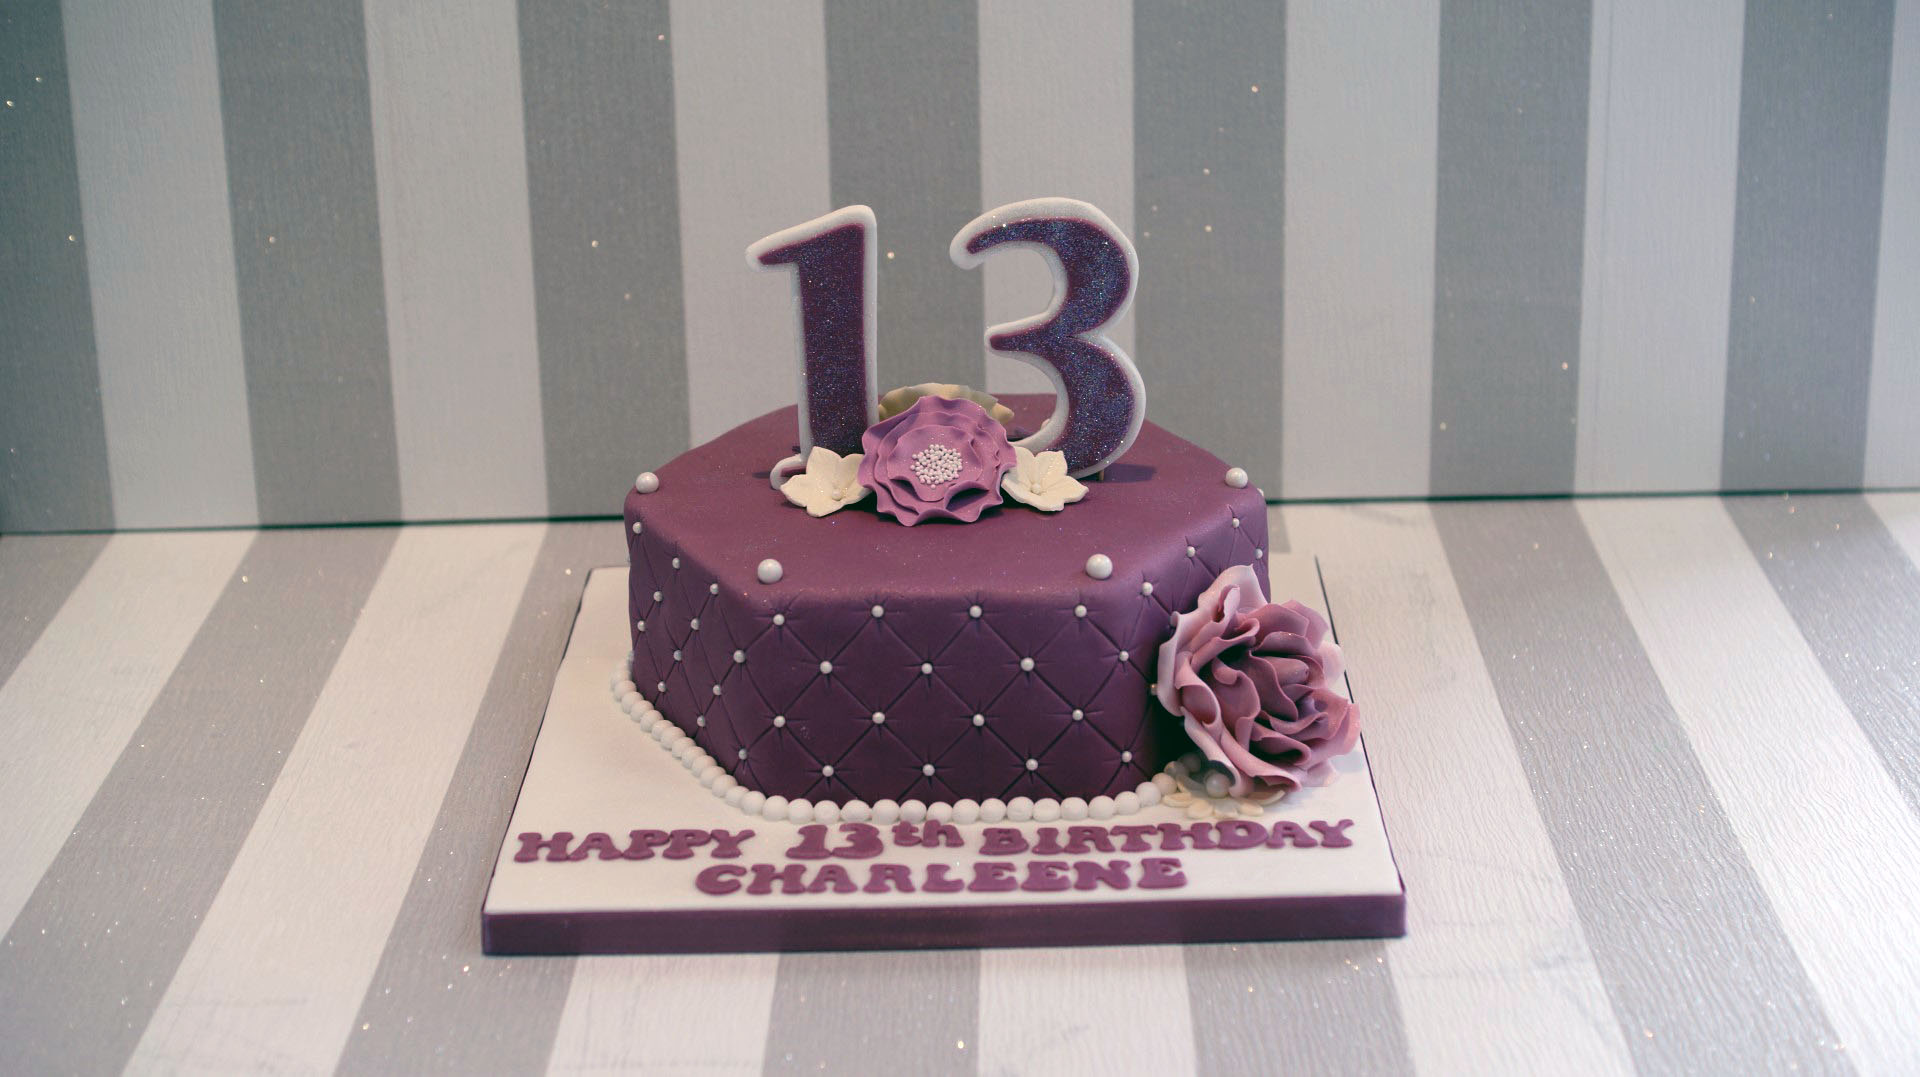 Corporate Anniversary Cake Designs